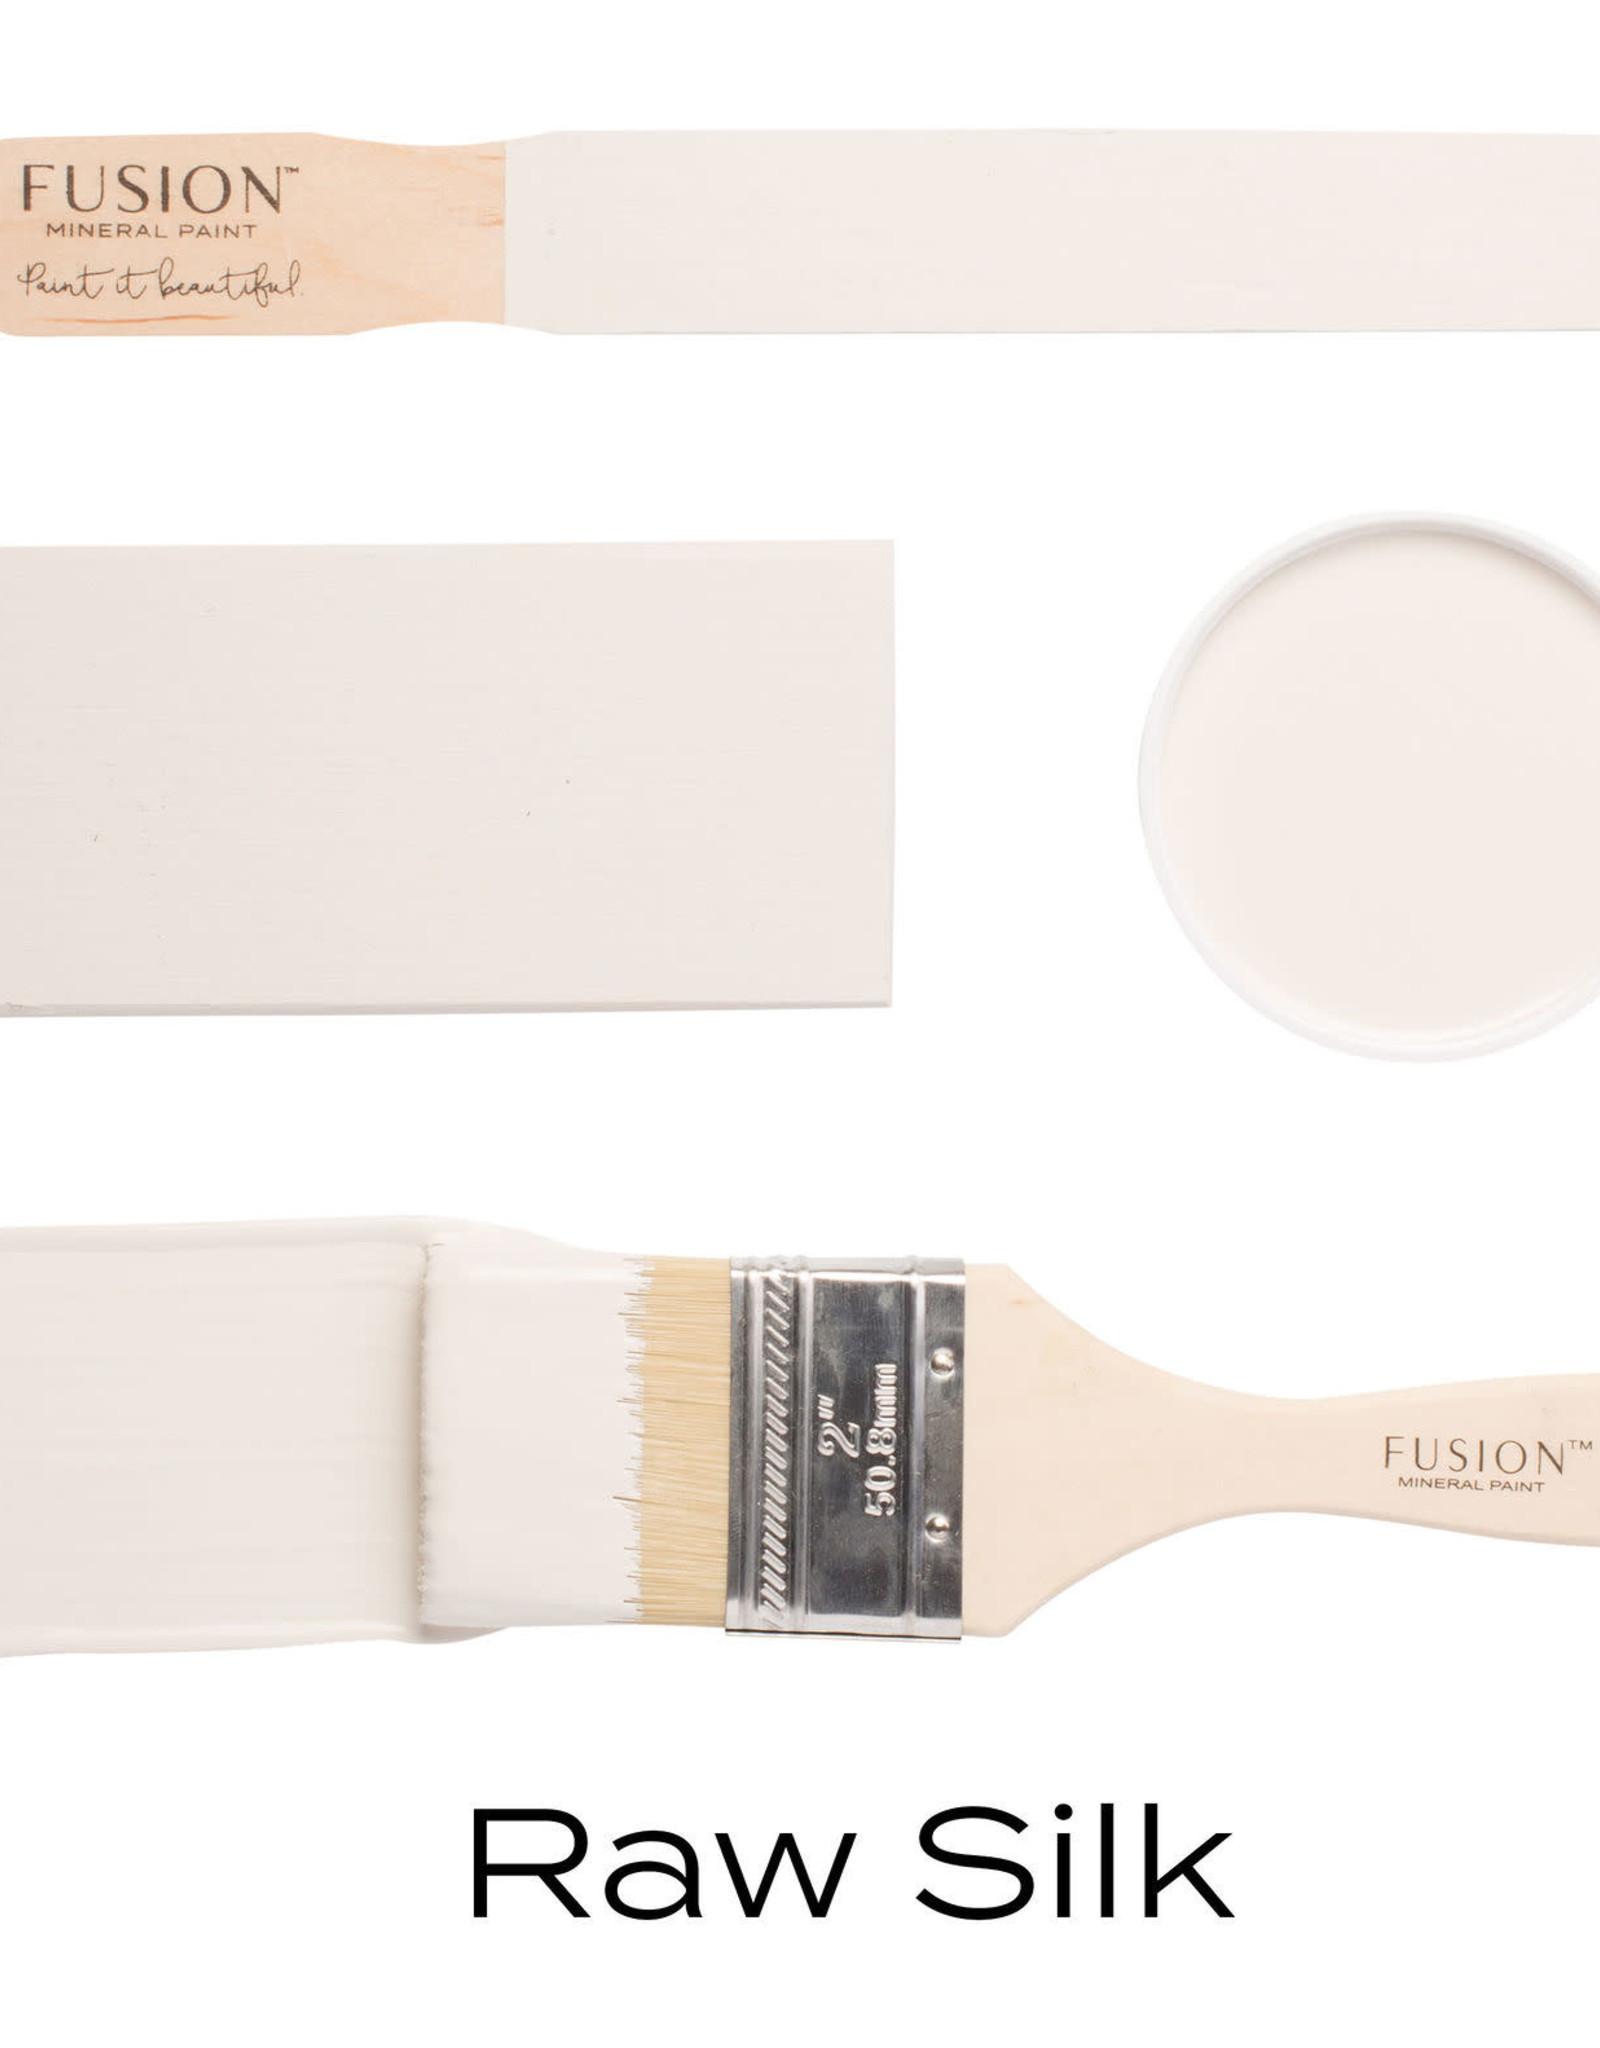 Fusion Mineral Paint Fusion Mineral Paint - Raw Silk 37ml